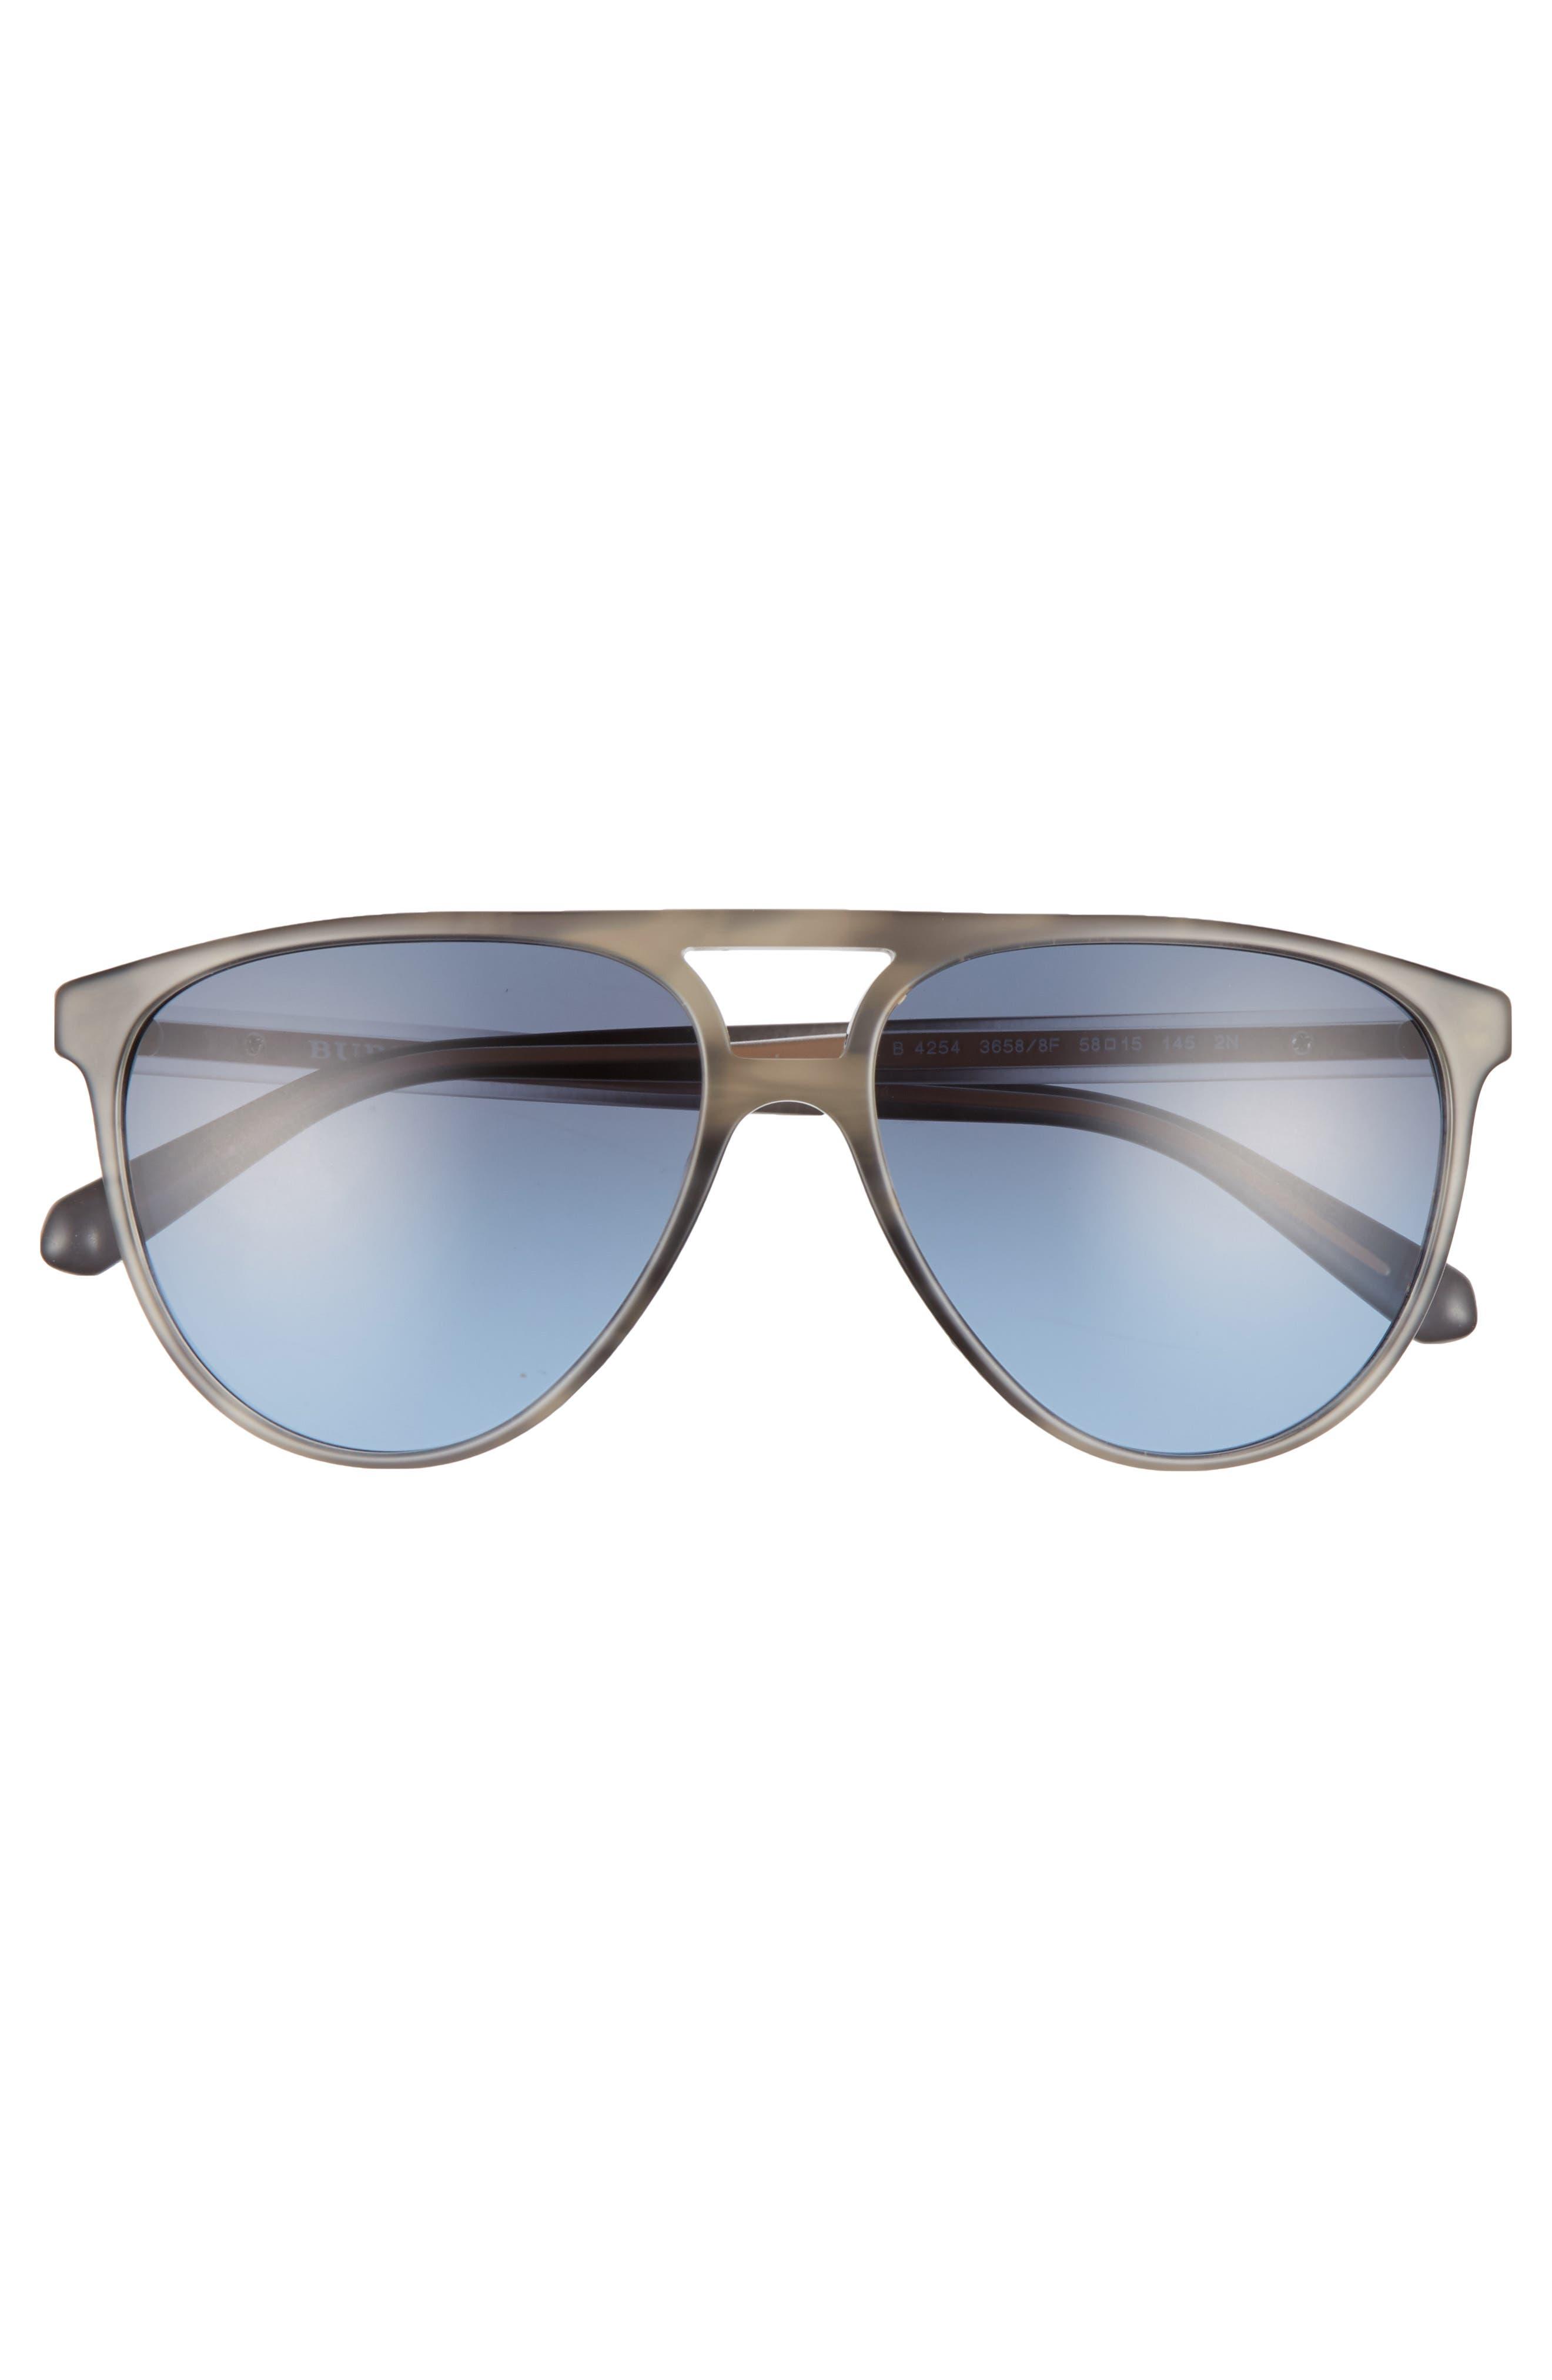 58mm Aviator Sunglasses,                             Alternate thumbnail 2, color,                             Grey/ Blue